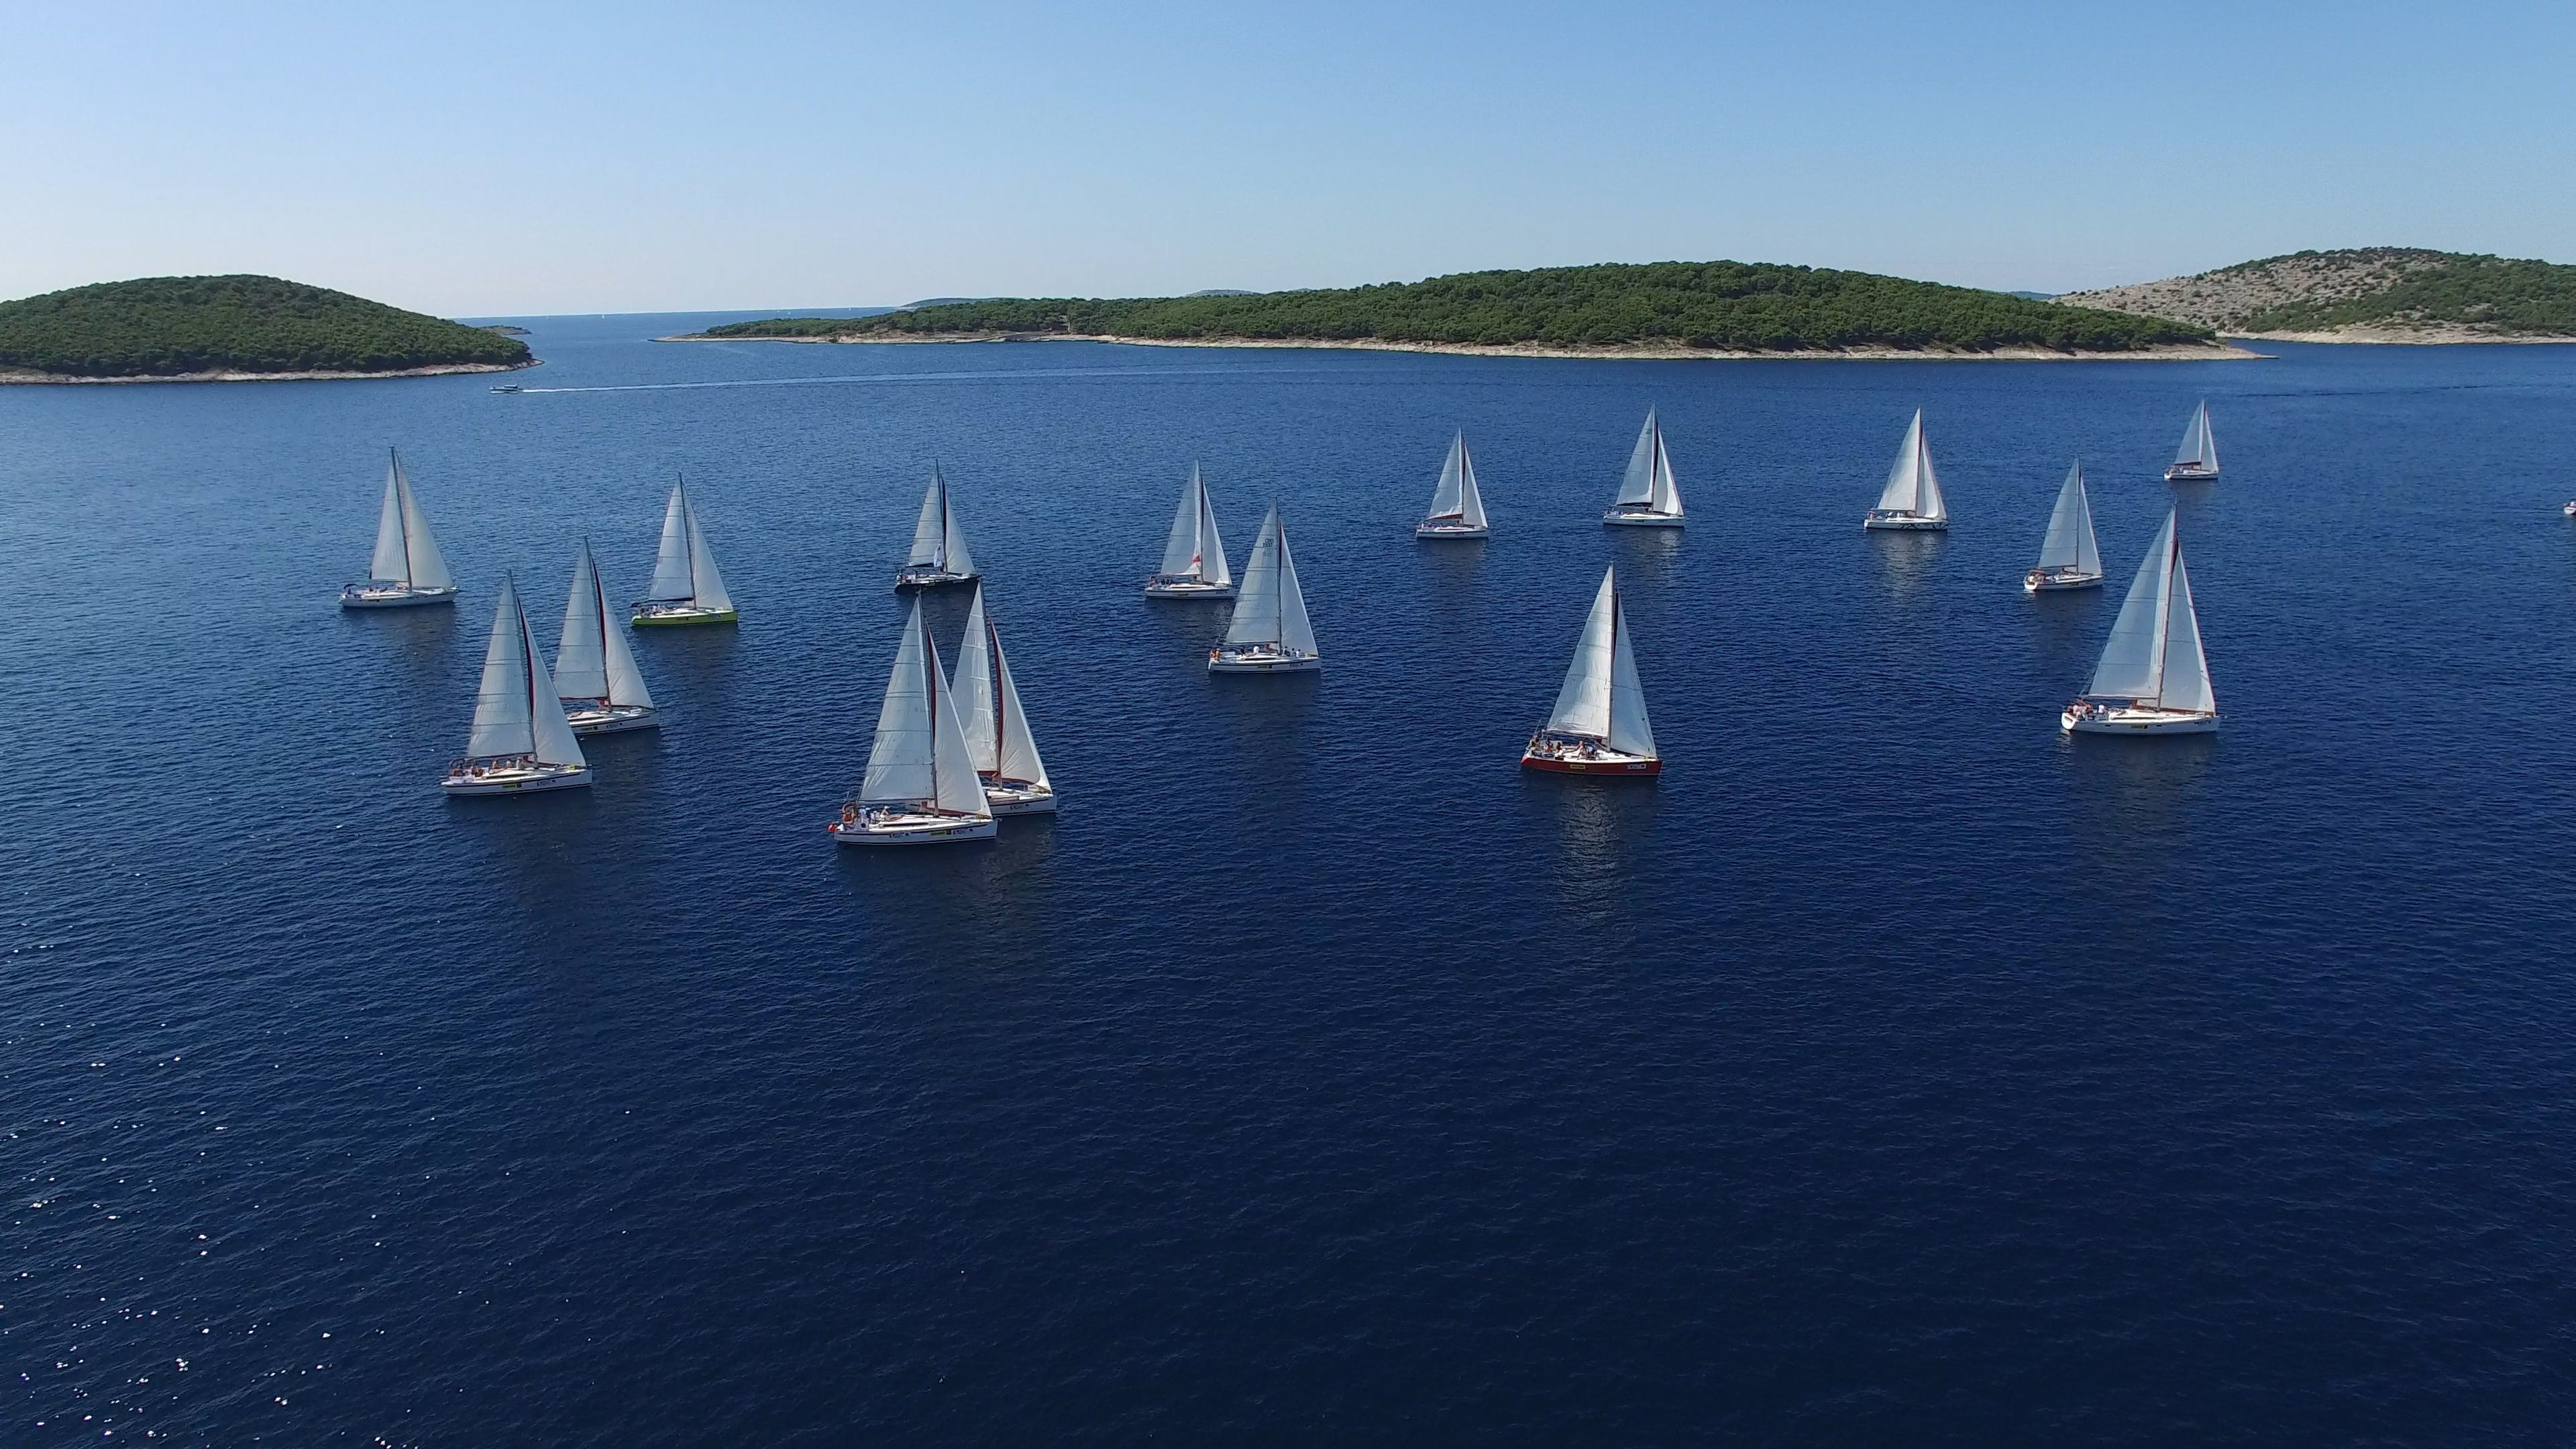 blue, boats, daylight